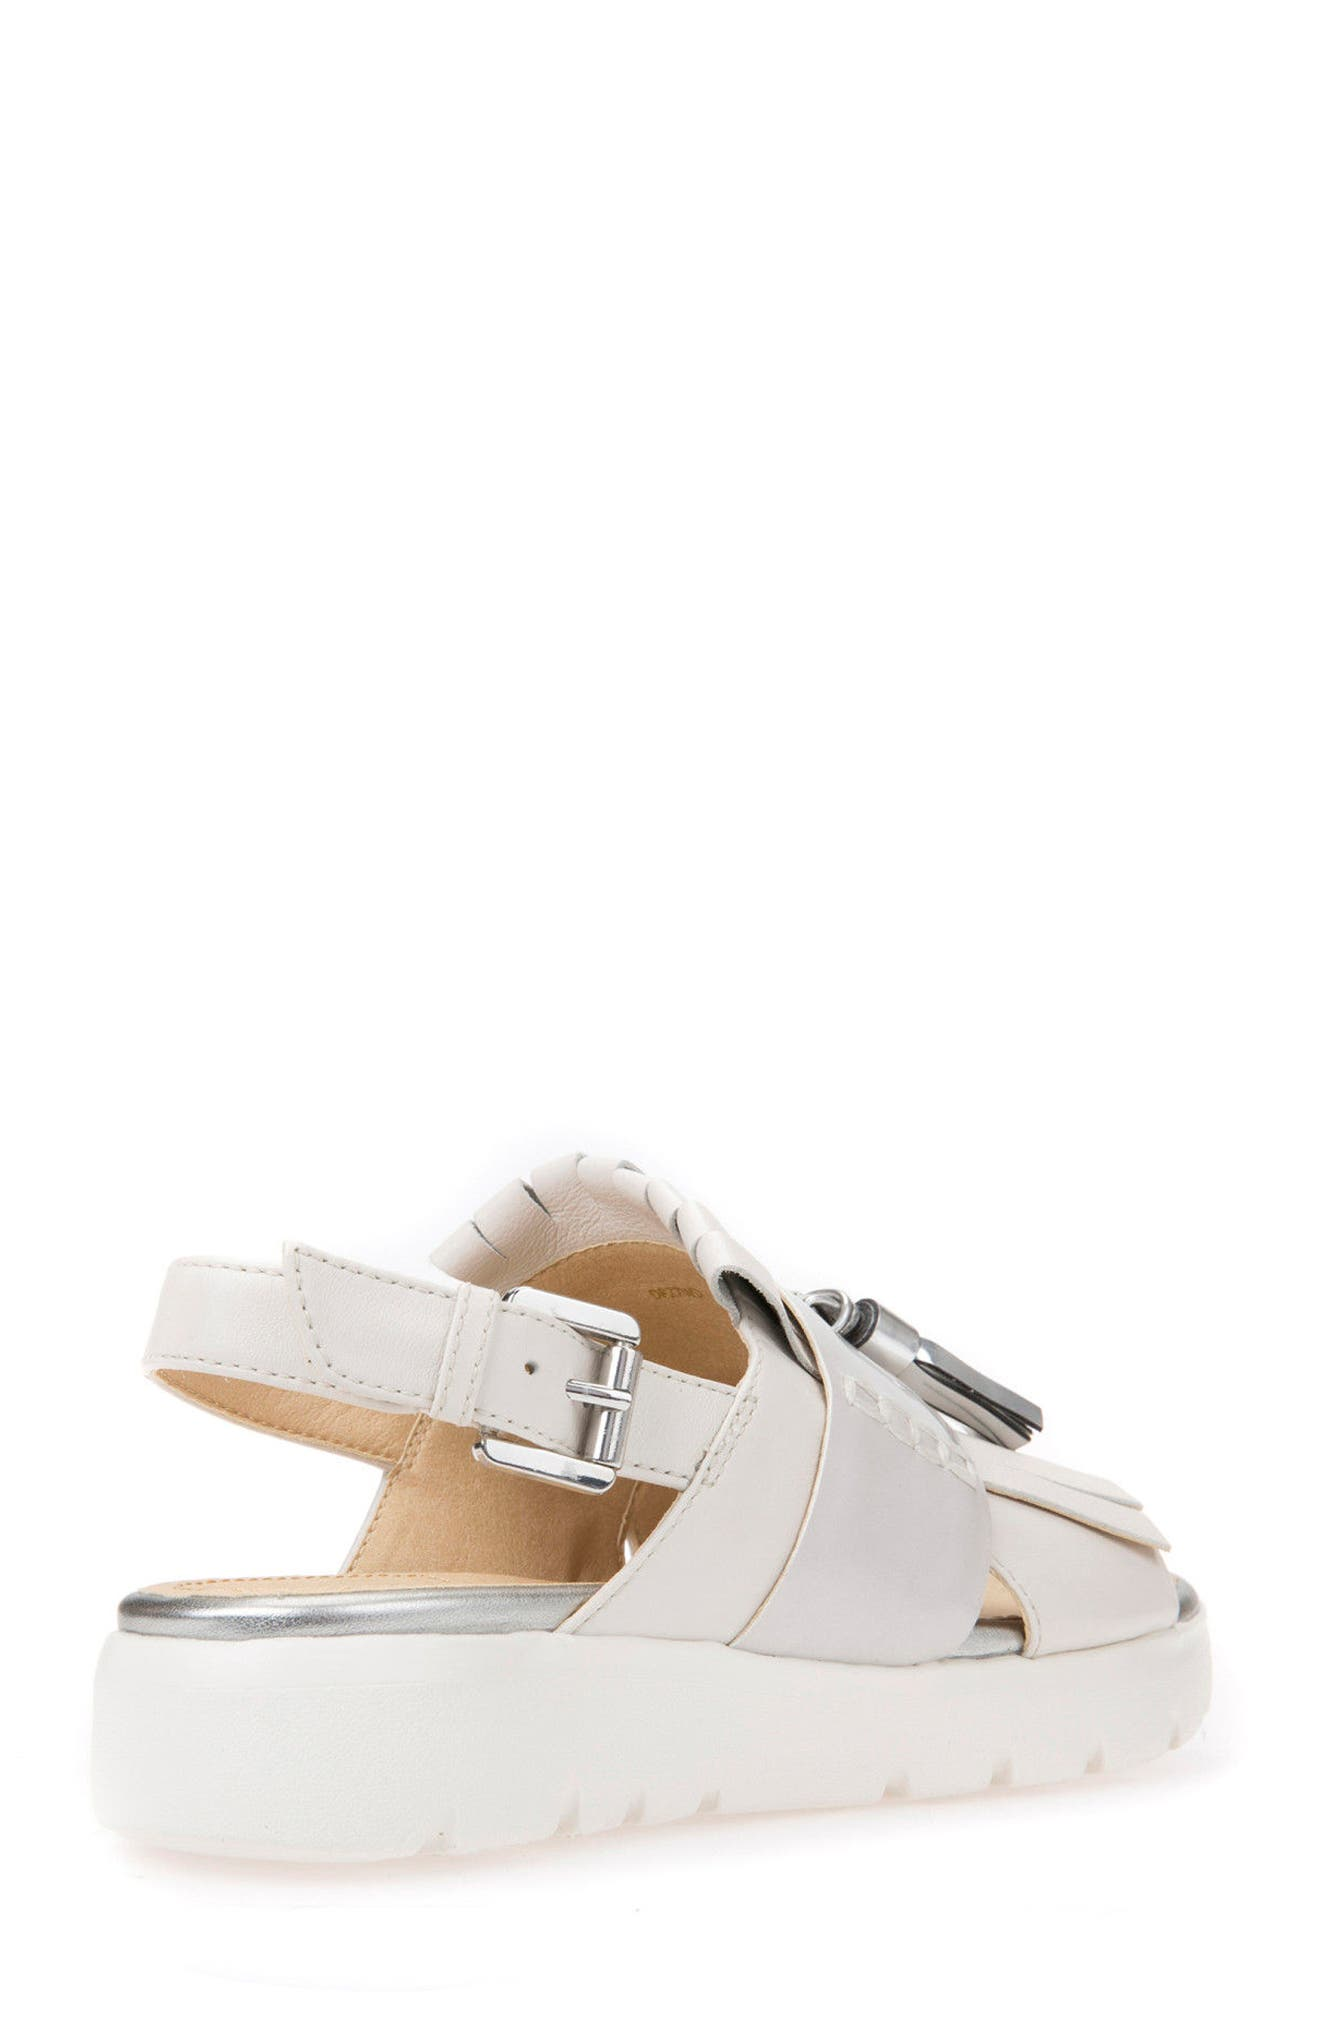 Amalitha Platform Sandal,                             Alternate thumbnail 2, color,                             OFF WHITE LEATHER